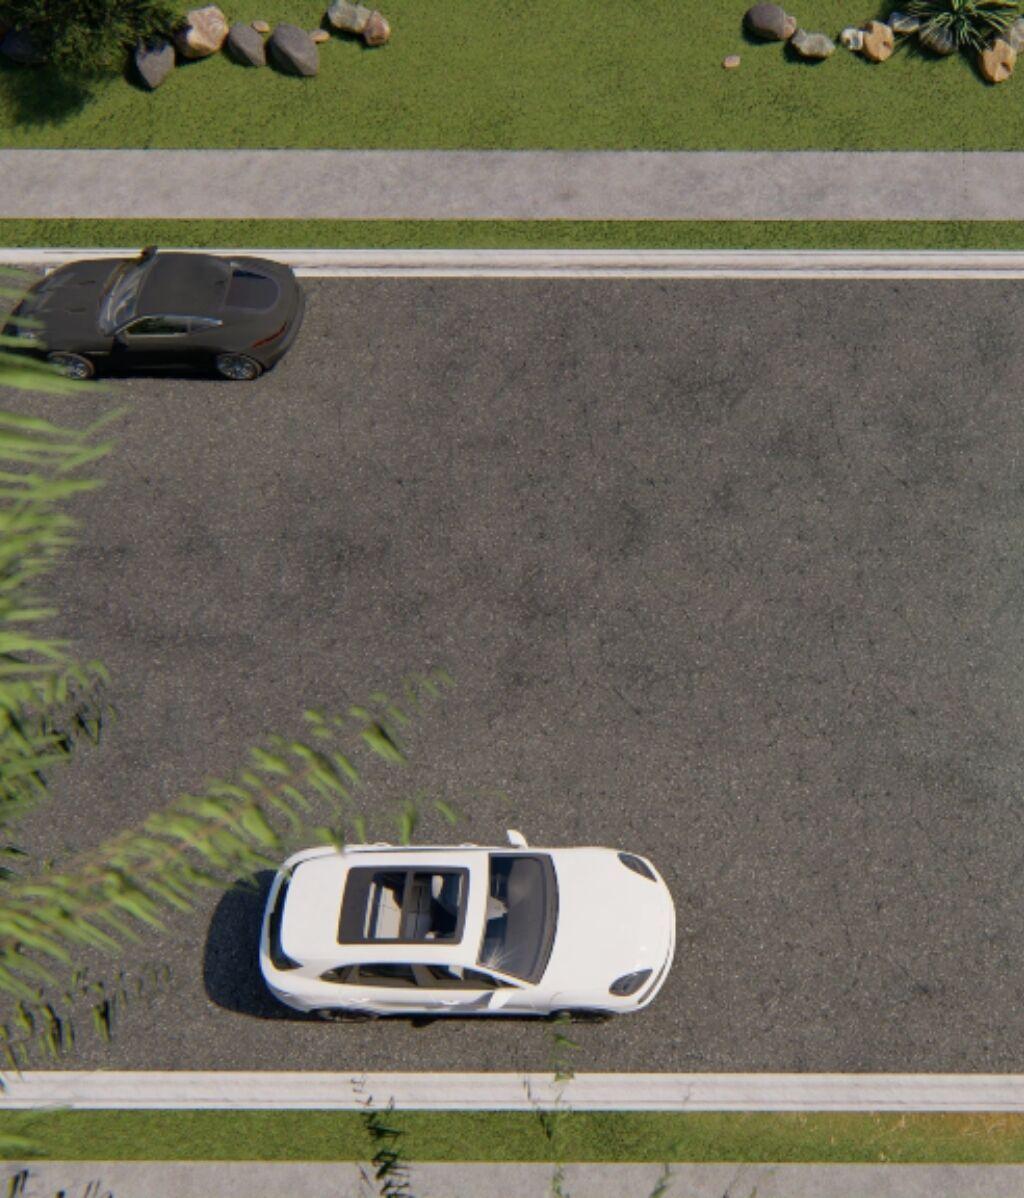 38. Imagen_Mediaset_Conducción autónomavv